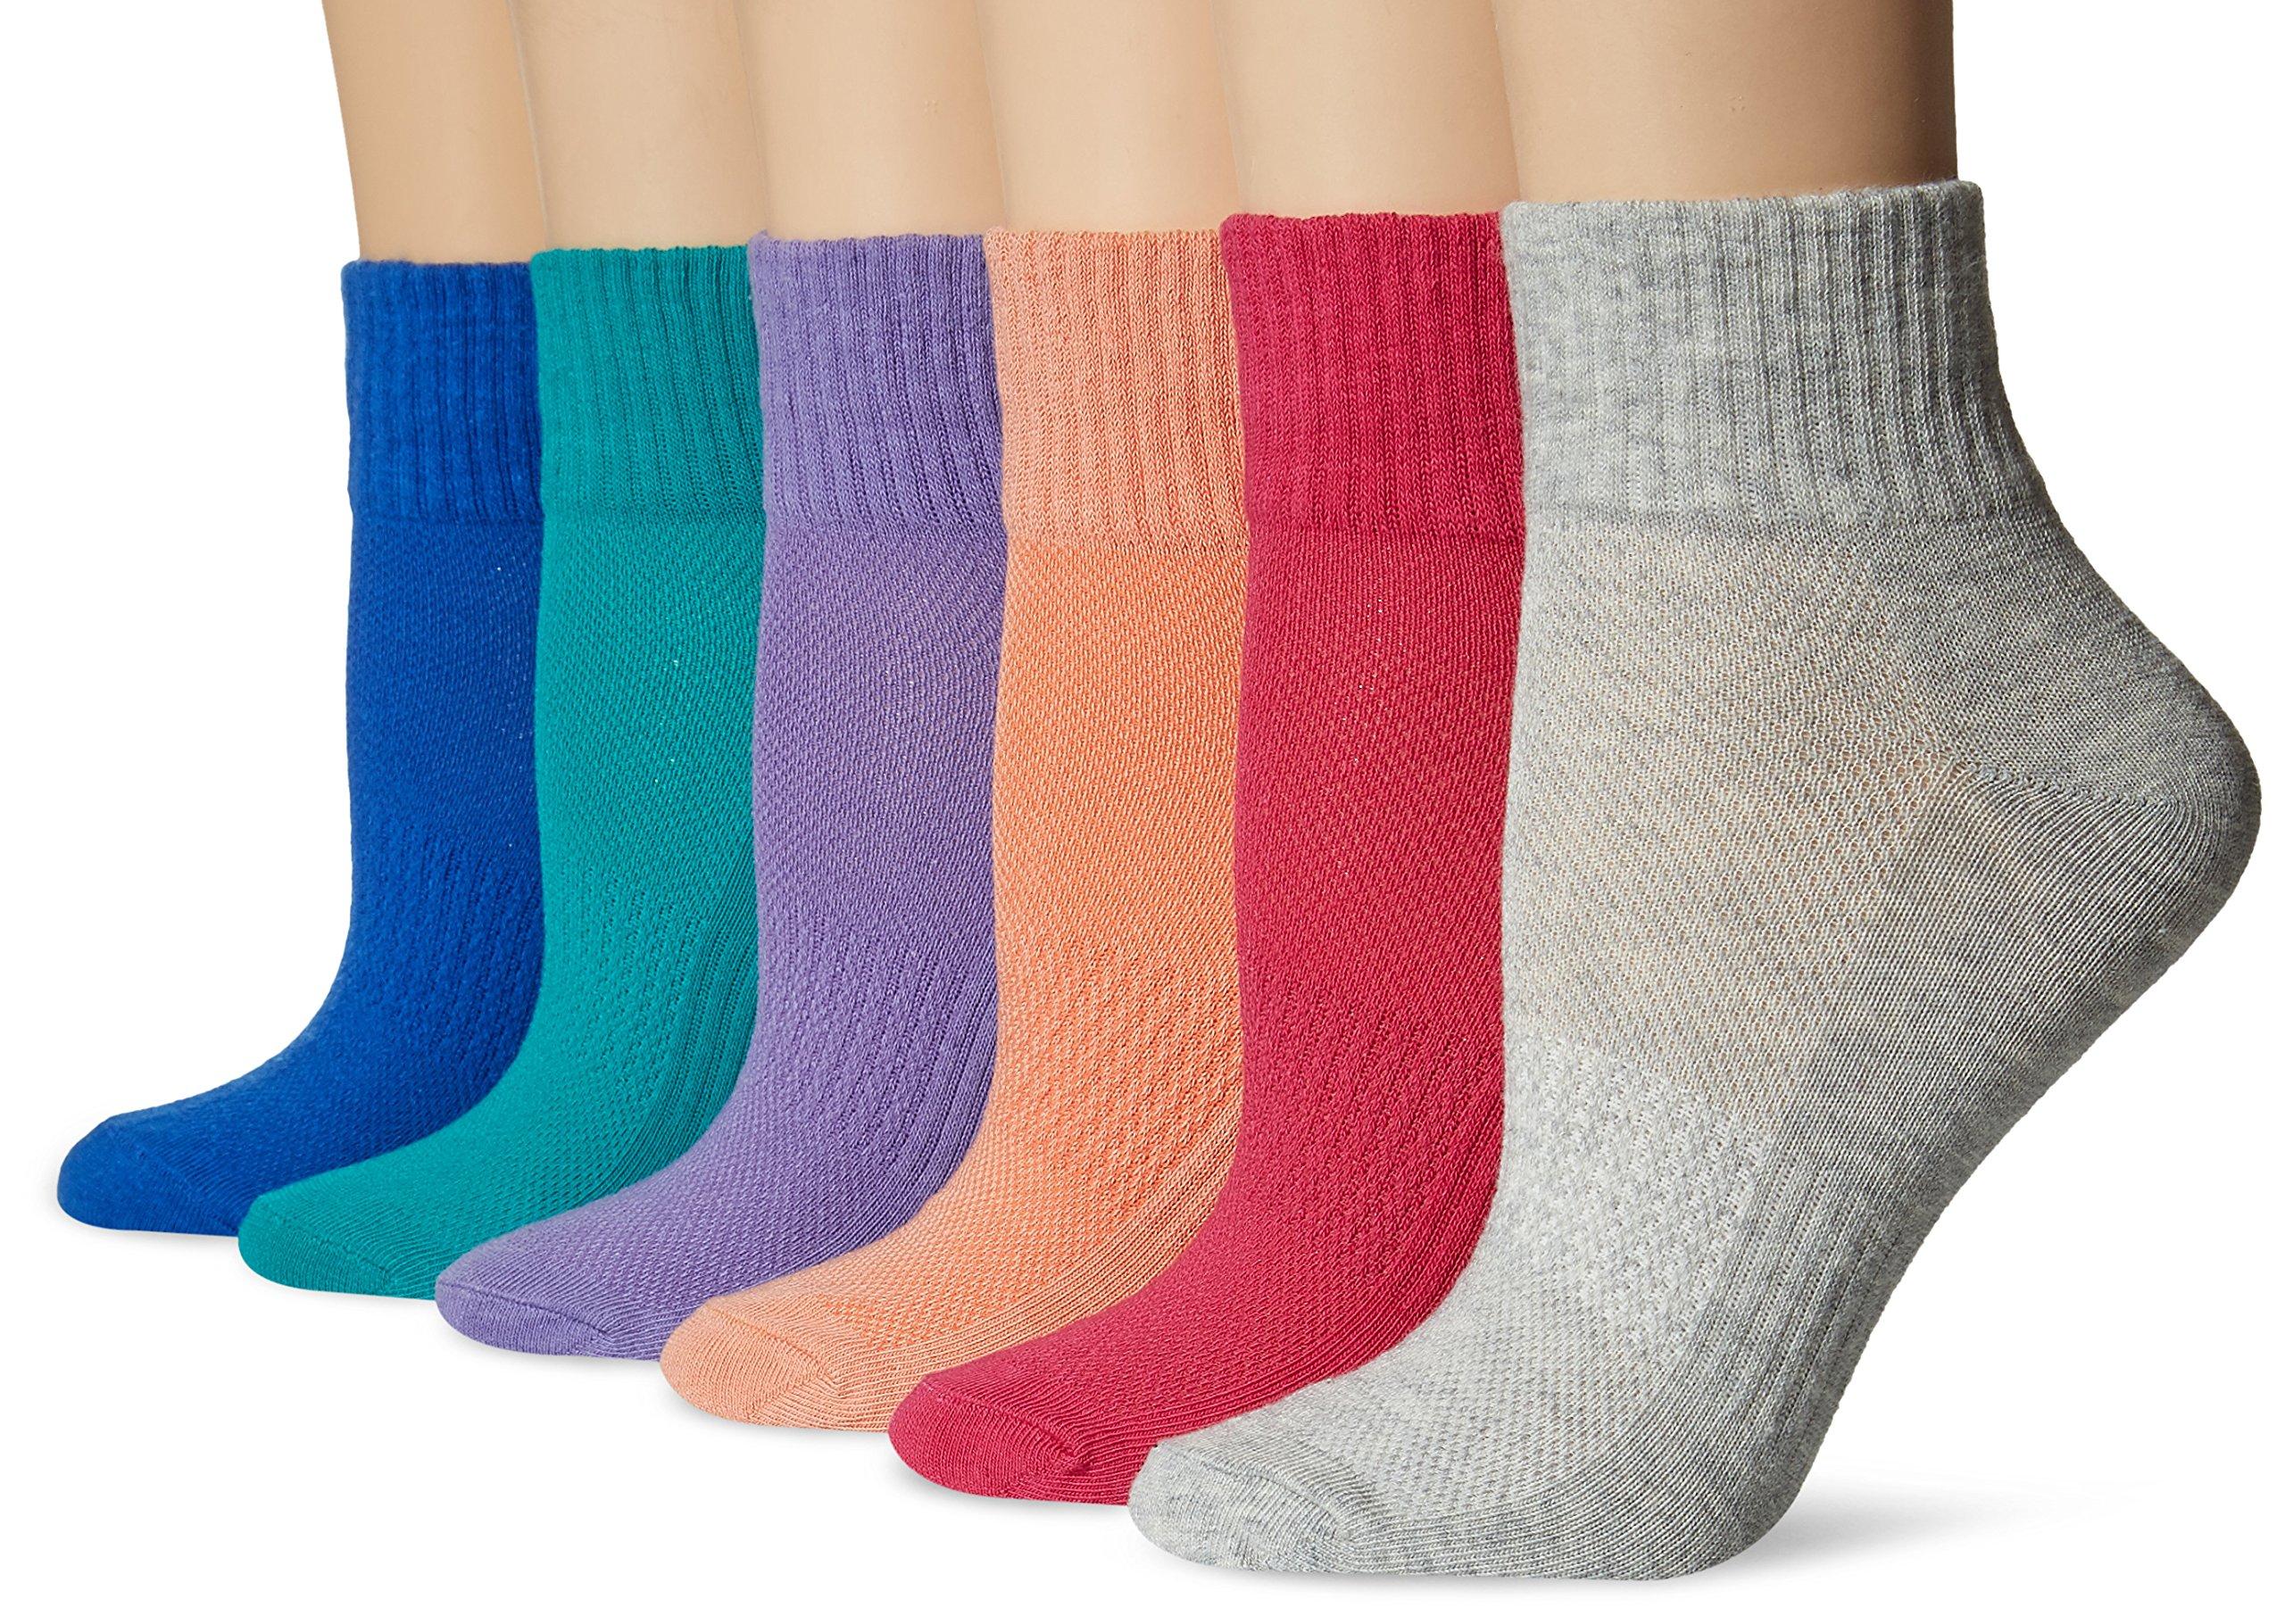 Keds Women's 6 Pack Mesh Top Quarter Socks, Purple Paisley, 9-11